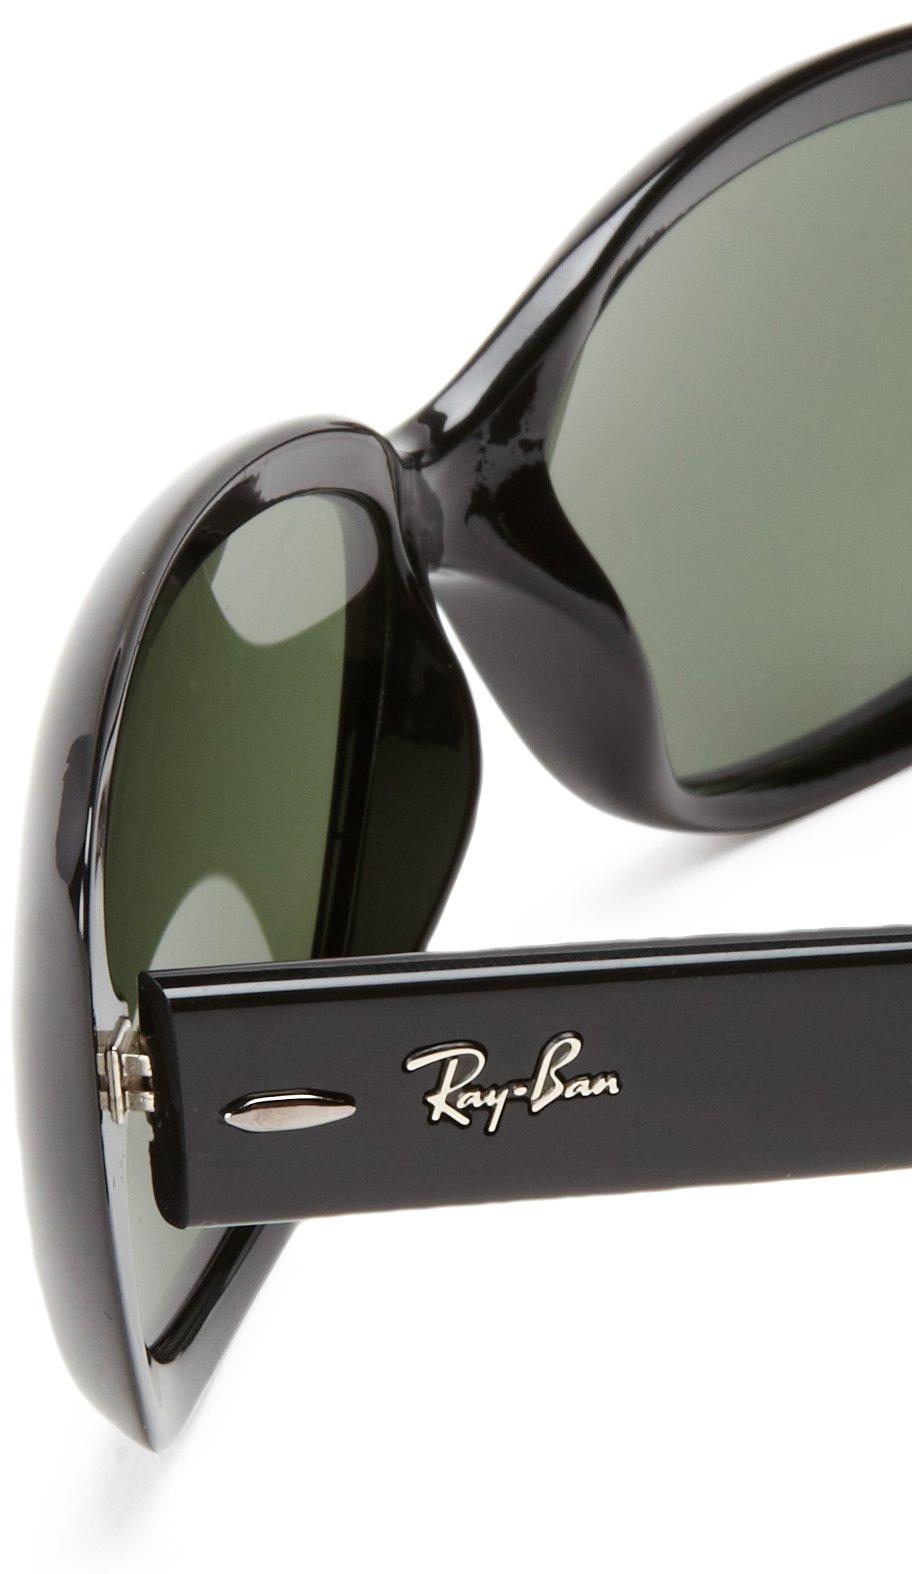 Ray-Ban-Womens-4101-Jackie-Ohh-Sunglasses